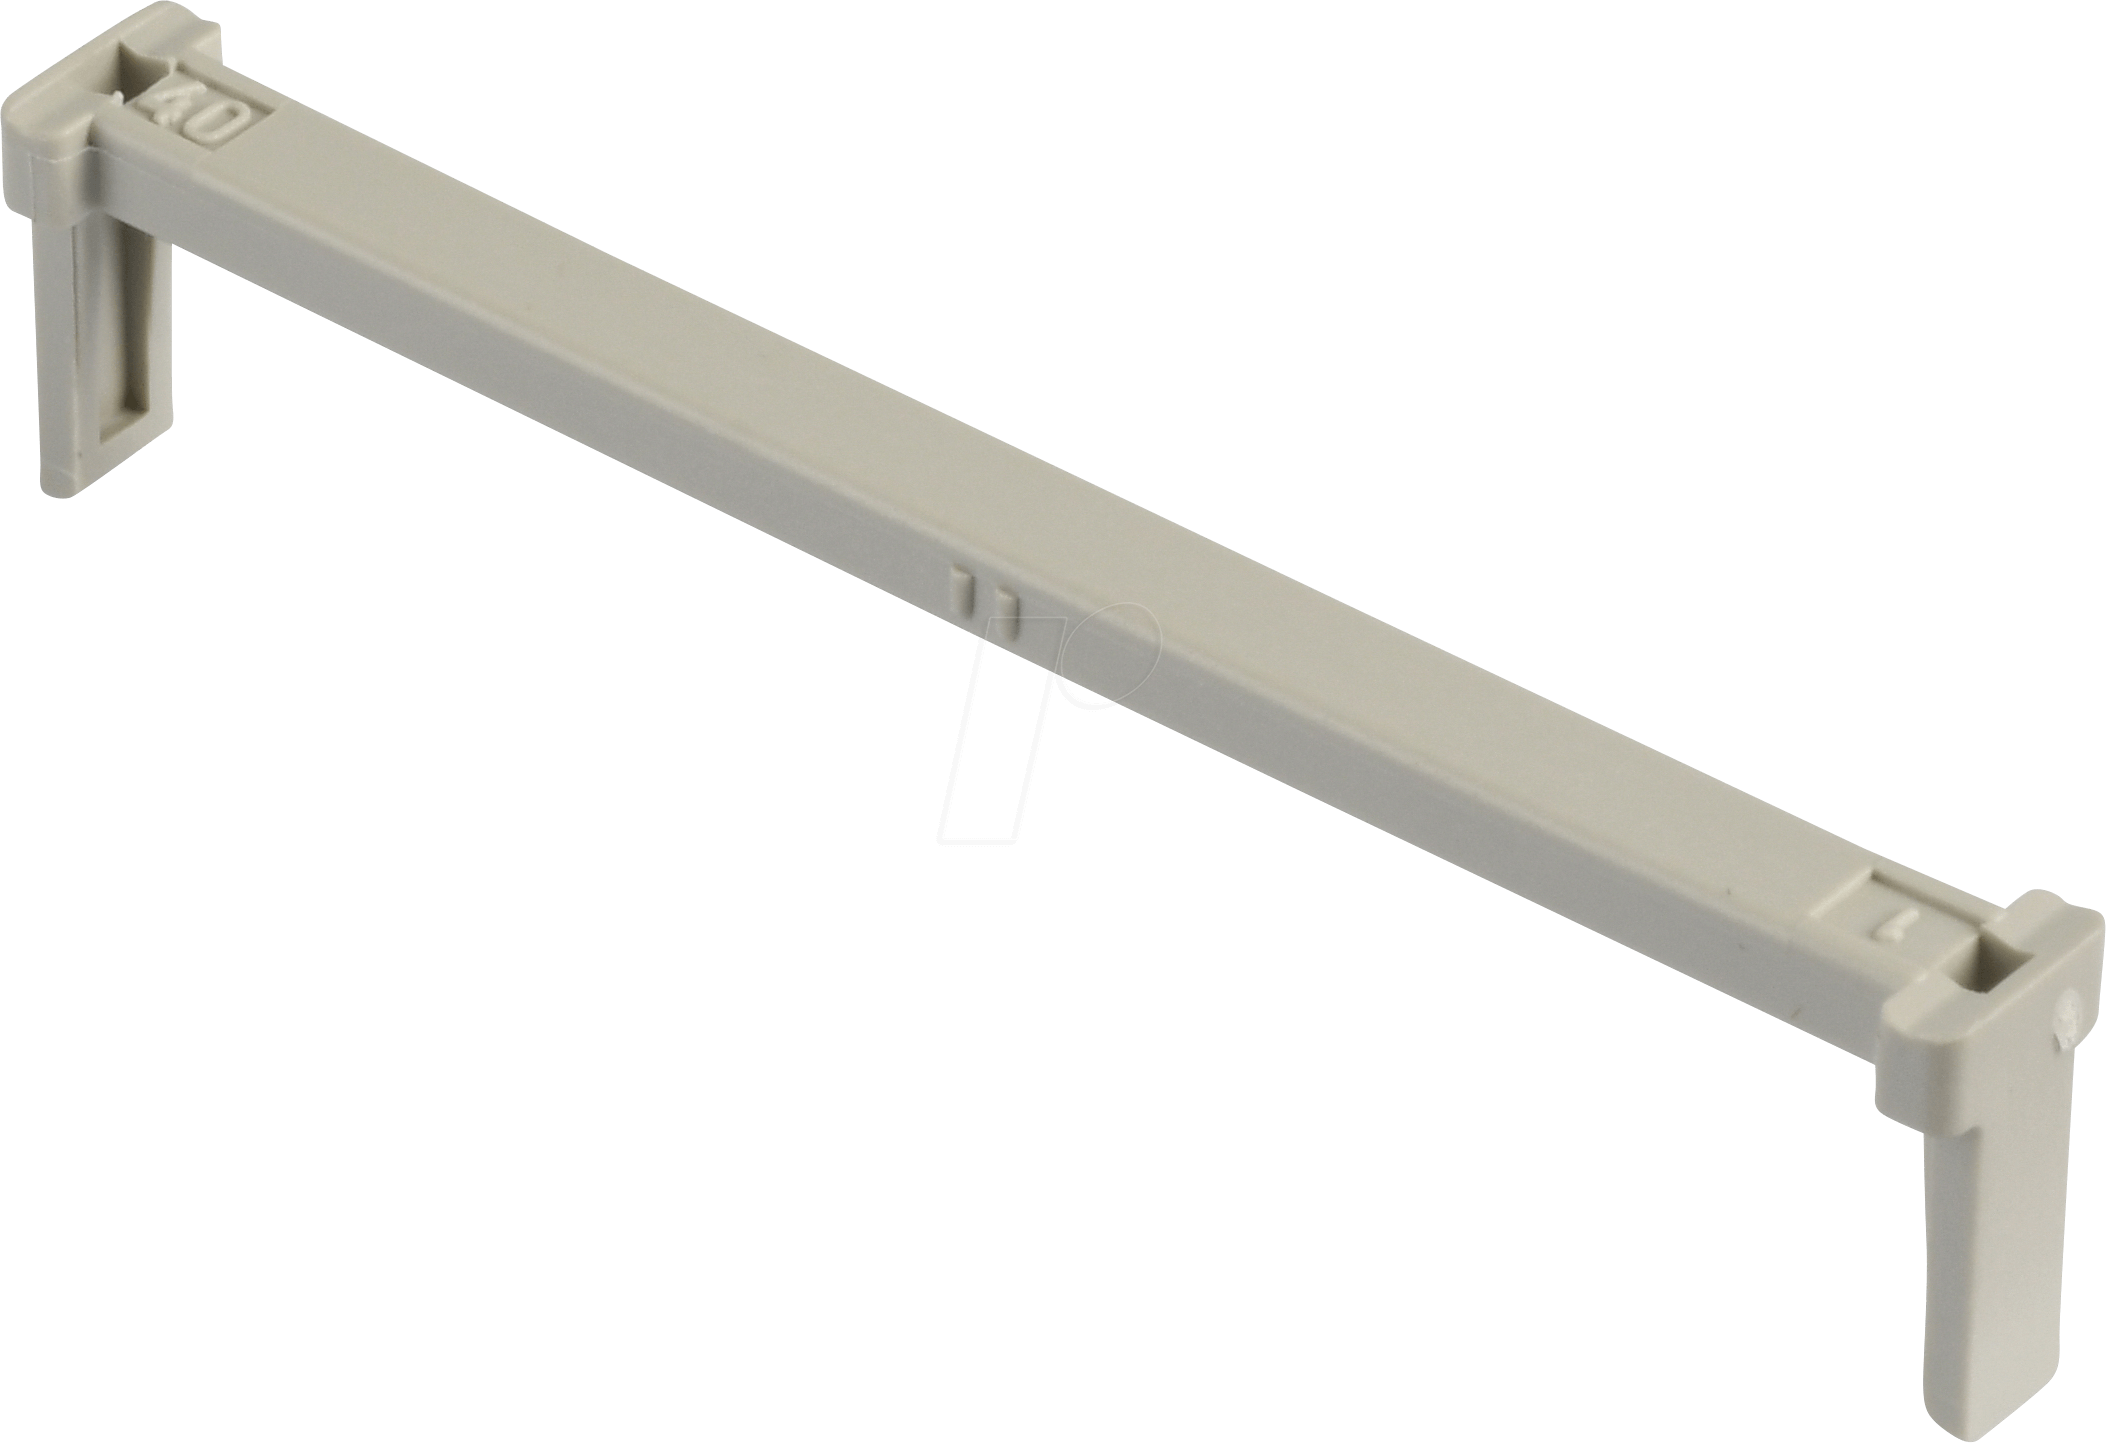 HAN 540 9002 - Zugentlastungsbügel 40polig